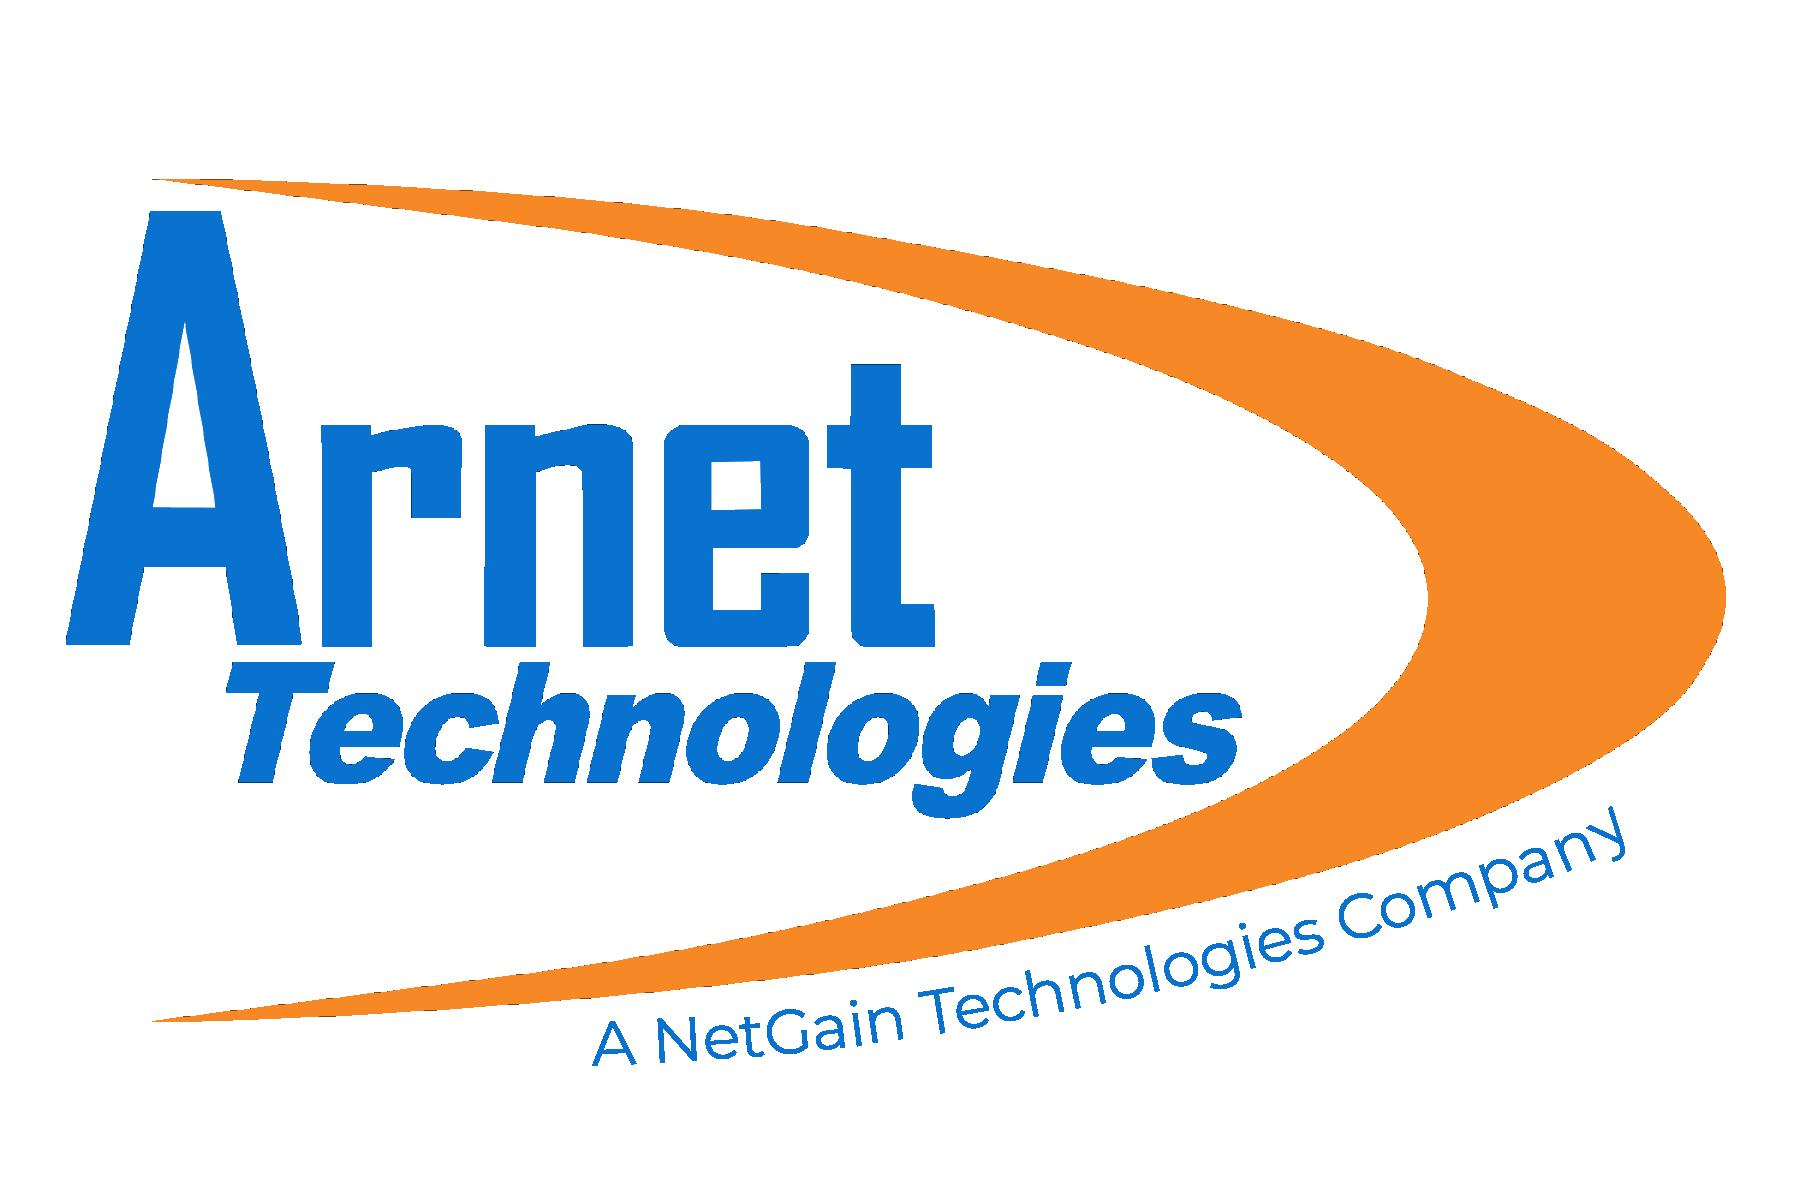 Arnet Technologies - A NetGain Company-1